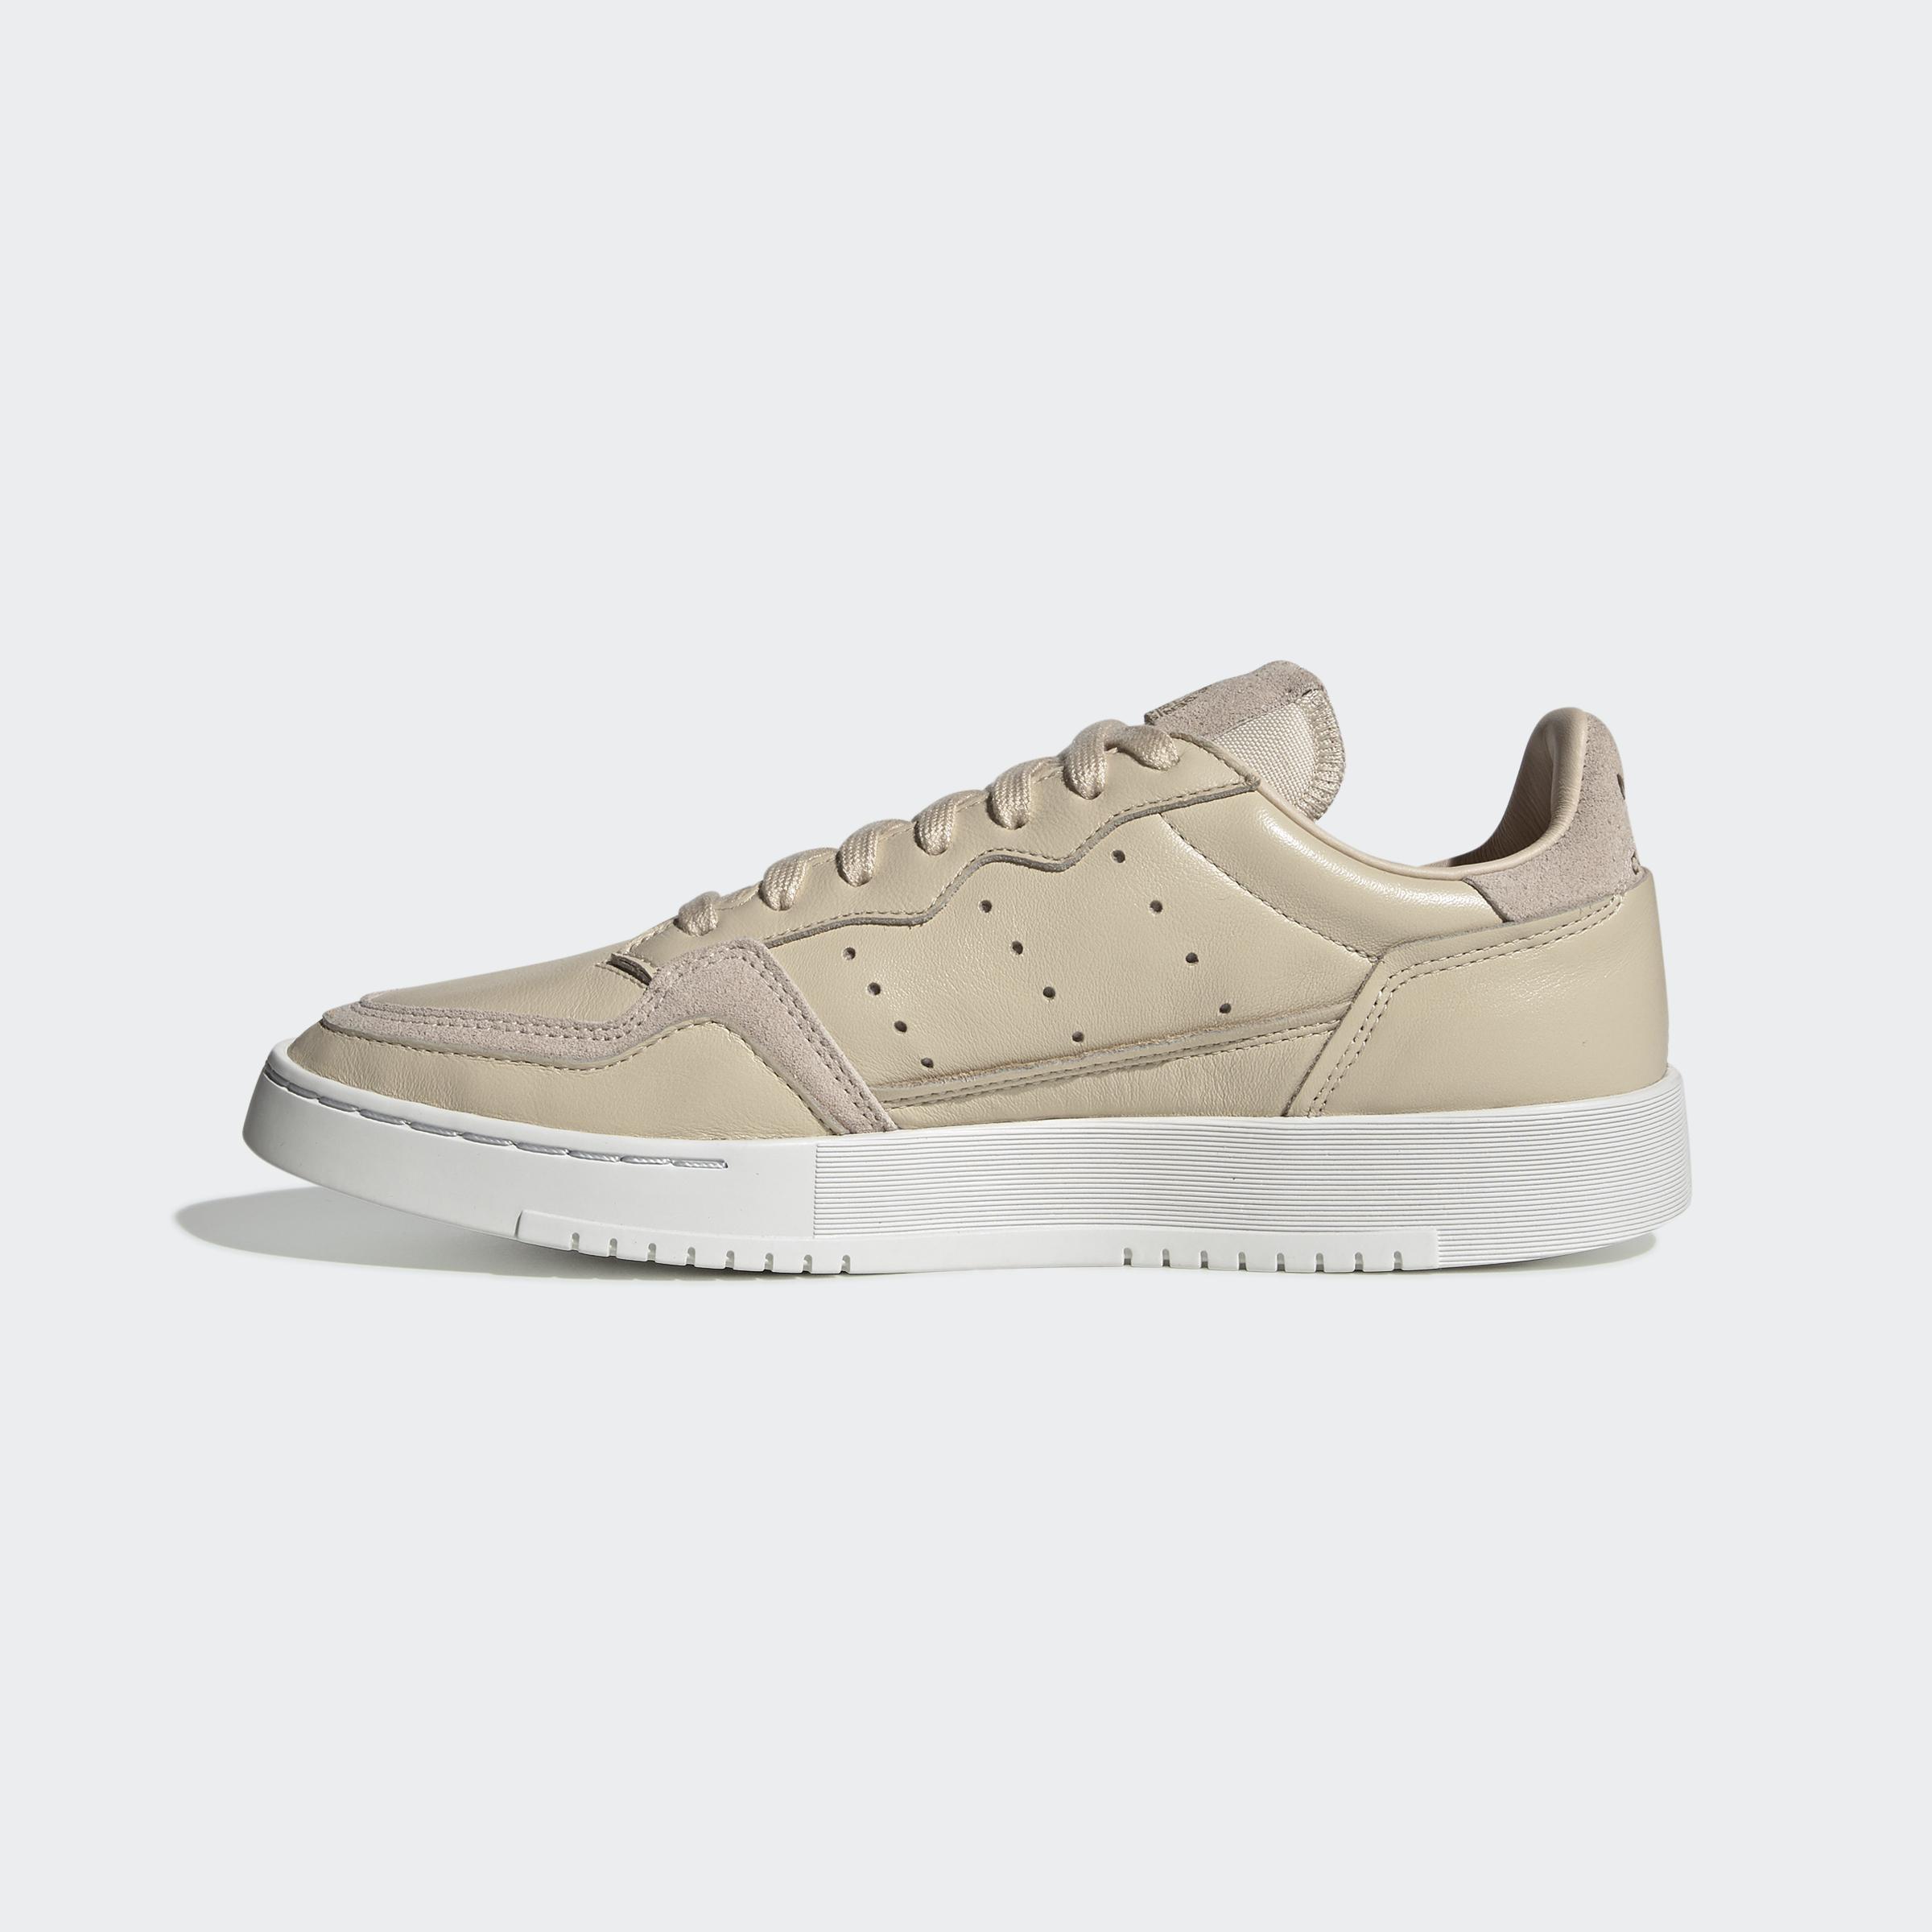 Indexbild 3 - adidas Originals Supercourt Schuh Herren, Damen Sneakers Turnschuhe  Freizeit